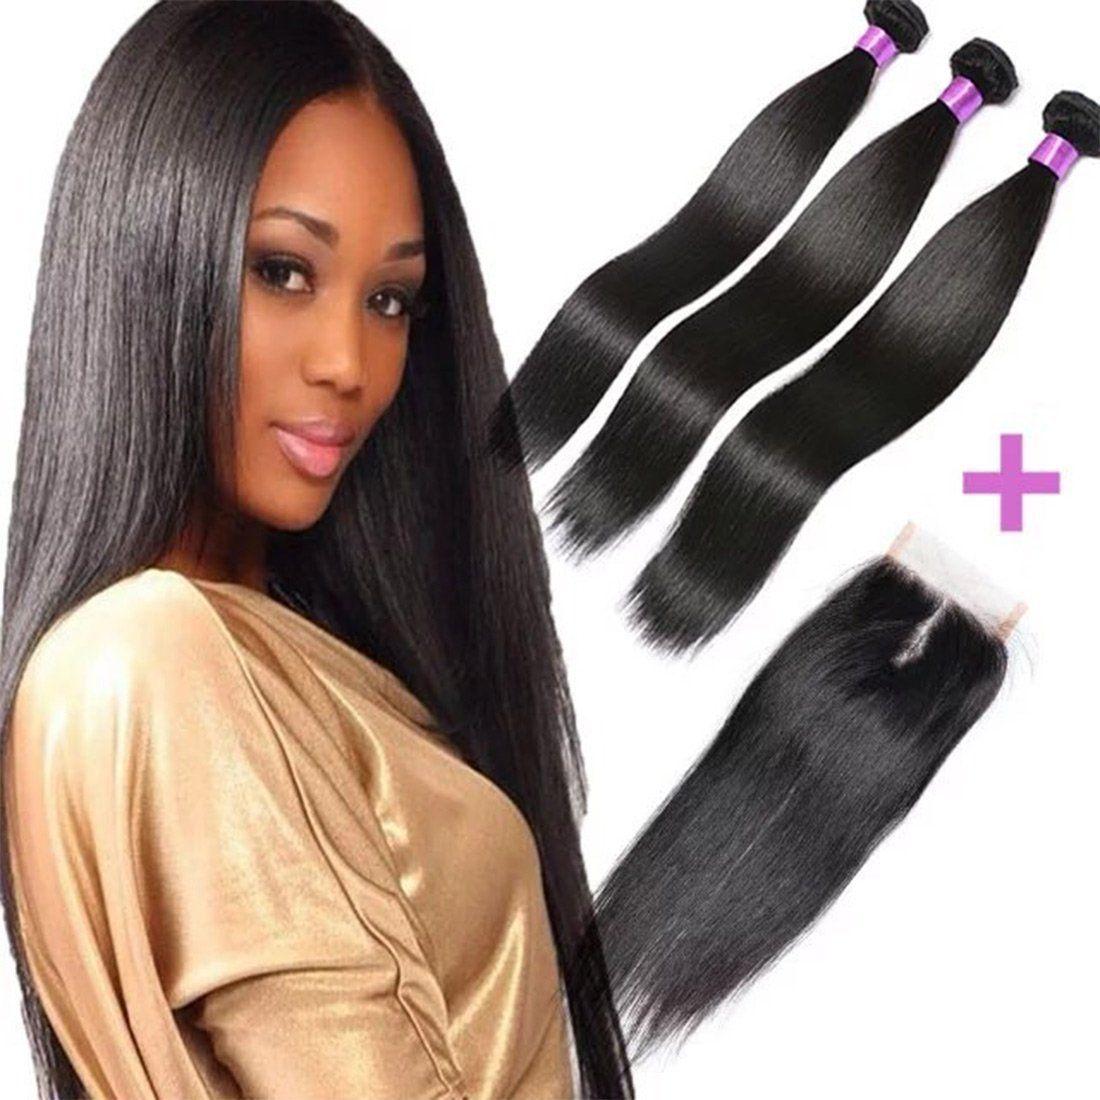 Fashion Queen Hair Straight Weave 7a Brazilian Virgin Hair 3 Bundles With Lace Closure Free Part Mixed Size Length P Queen Hair Hair Extensions Best Human Hair